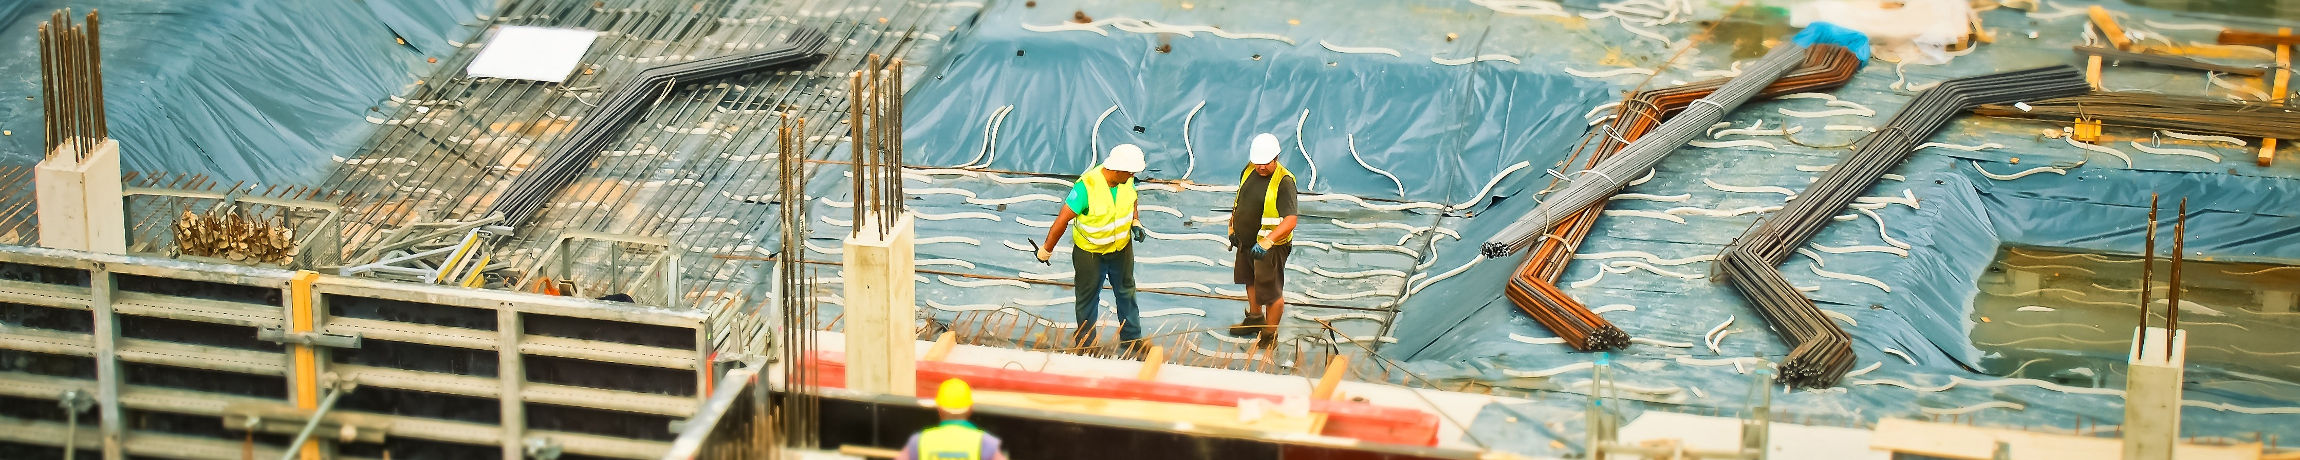 safety-energy-ristrutturazioni-edili-sassari